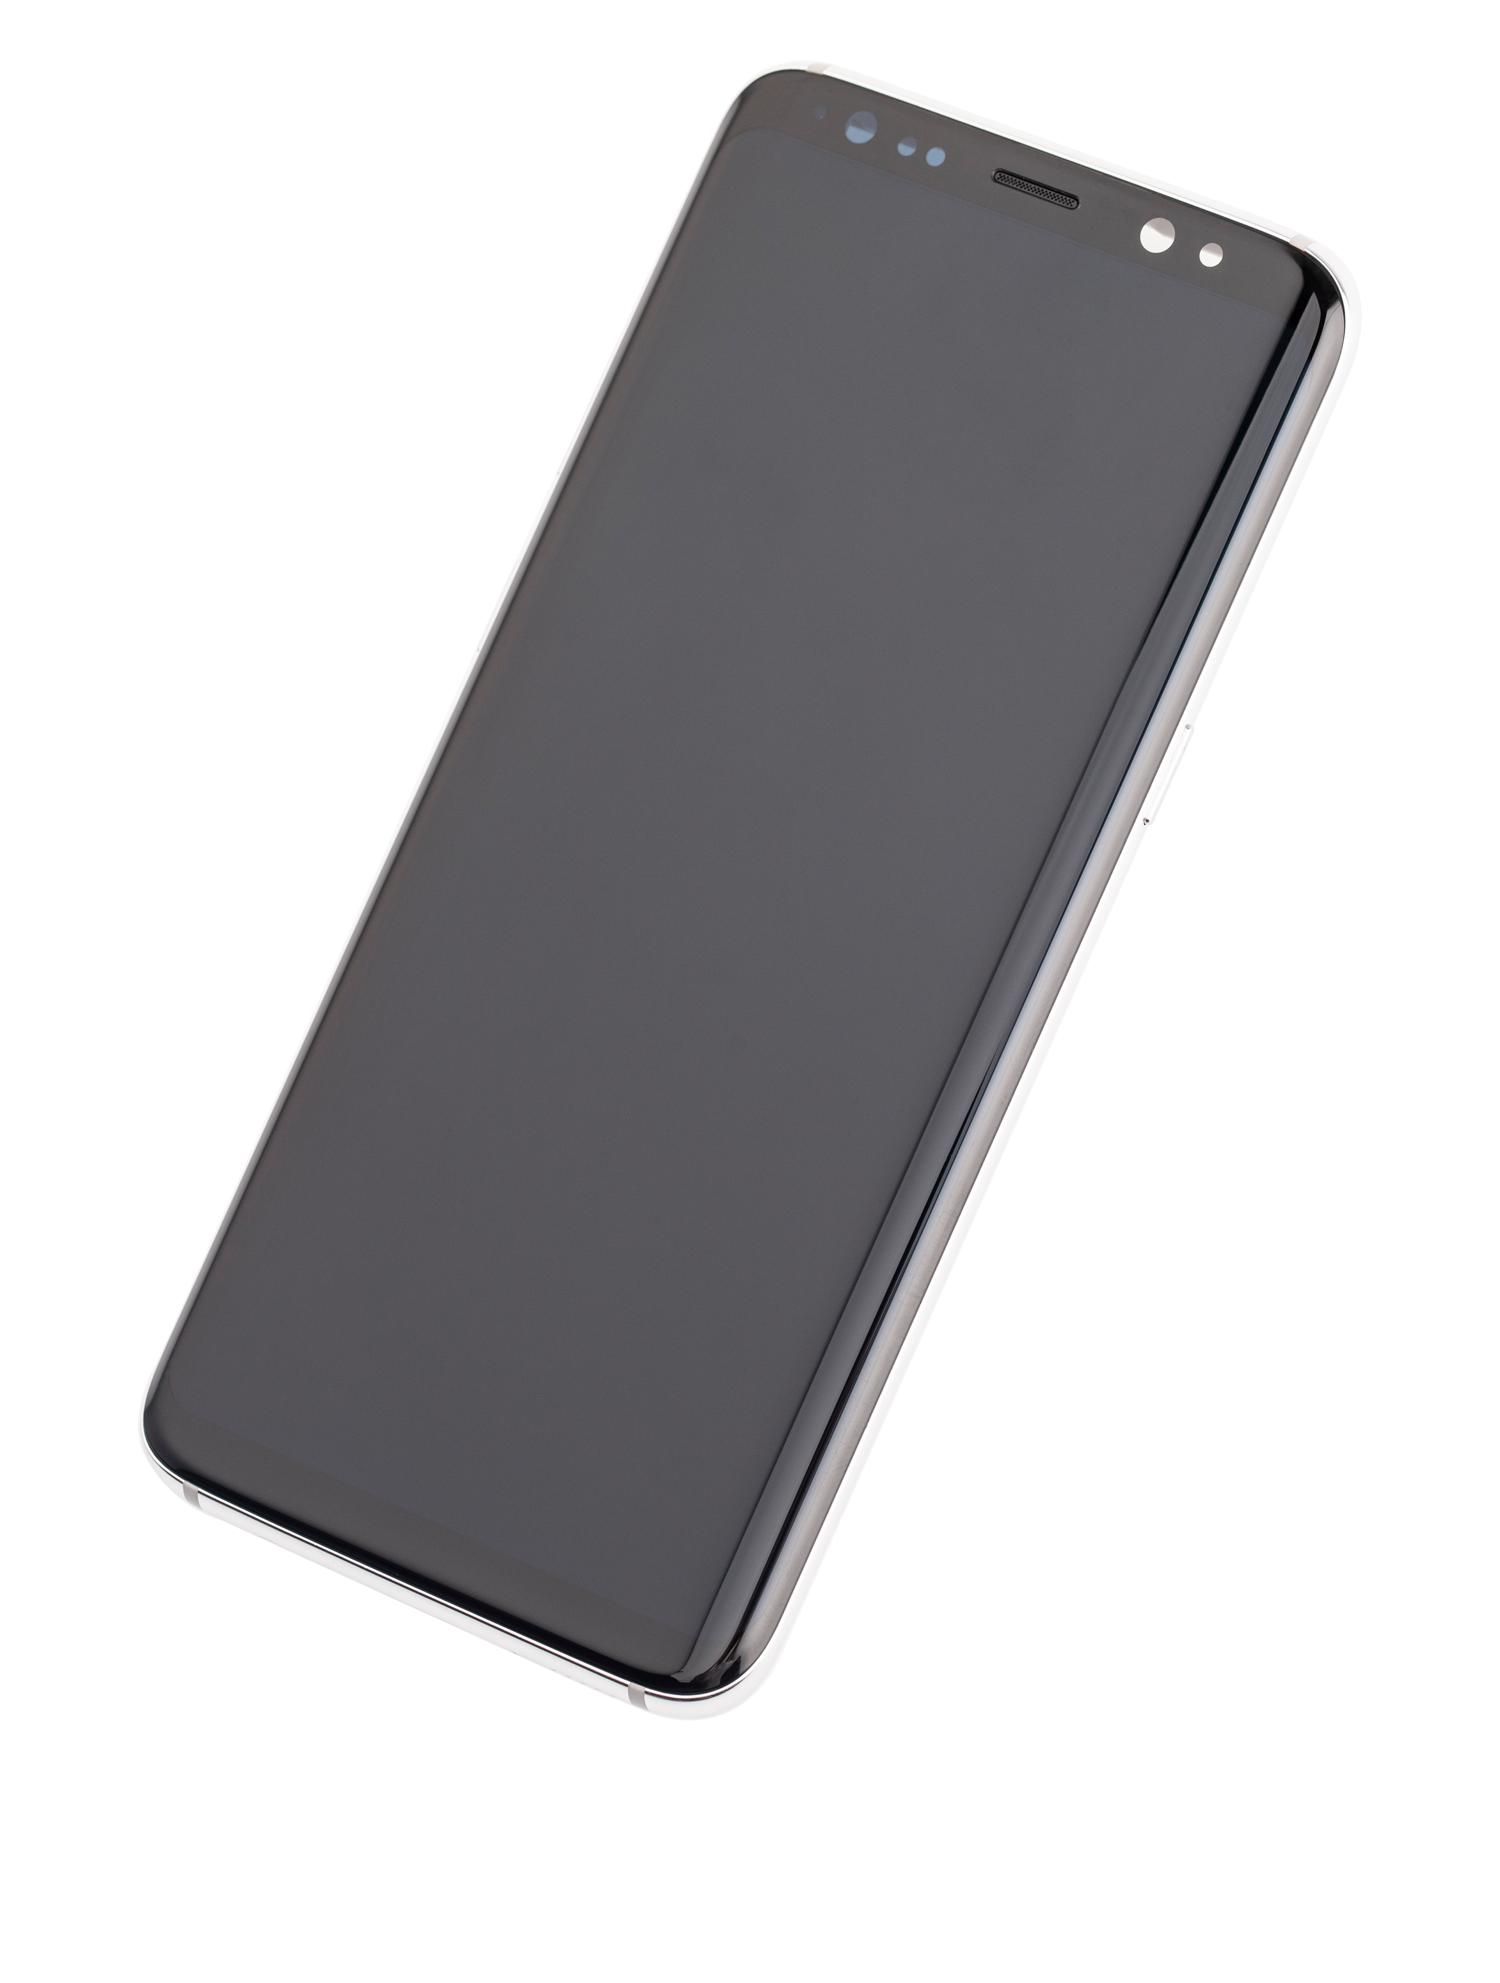 Samsung Galaxy S8 SM-G950 Display Module + Frame Silver